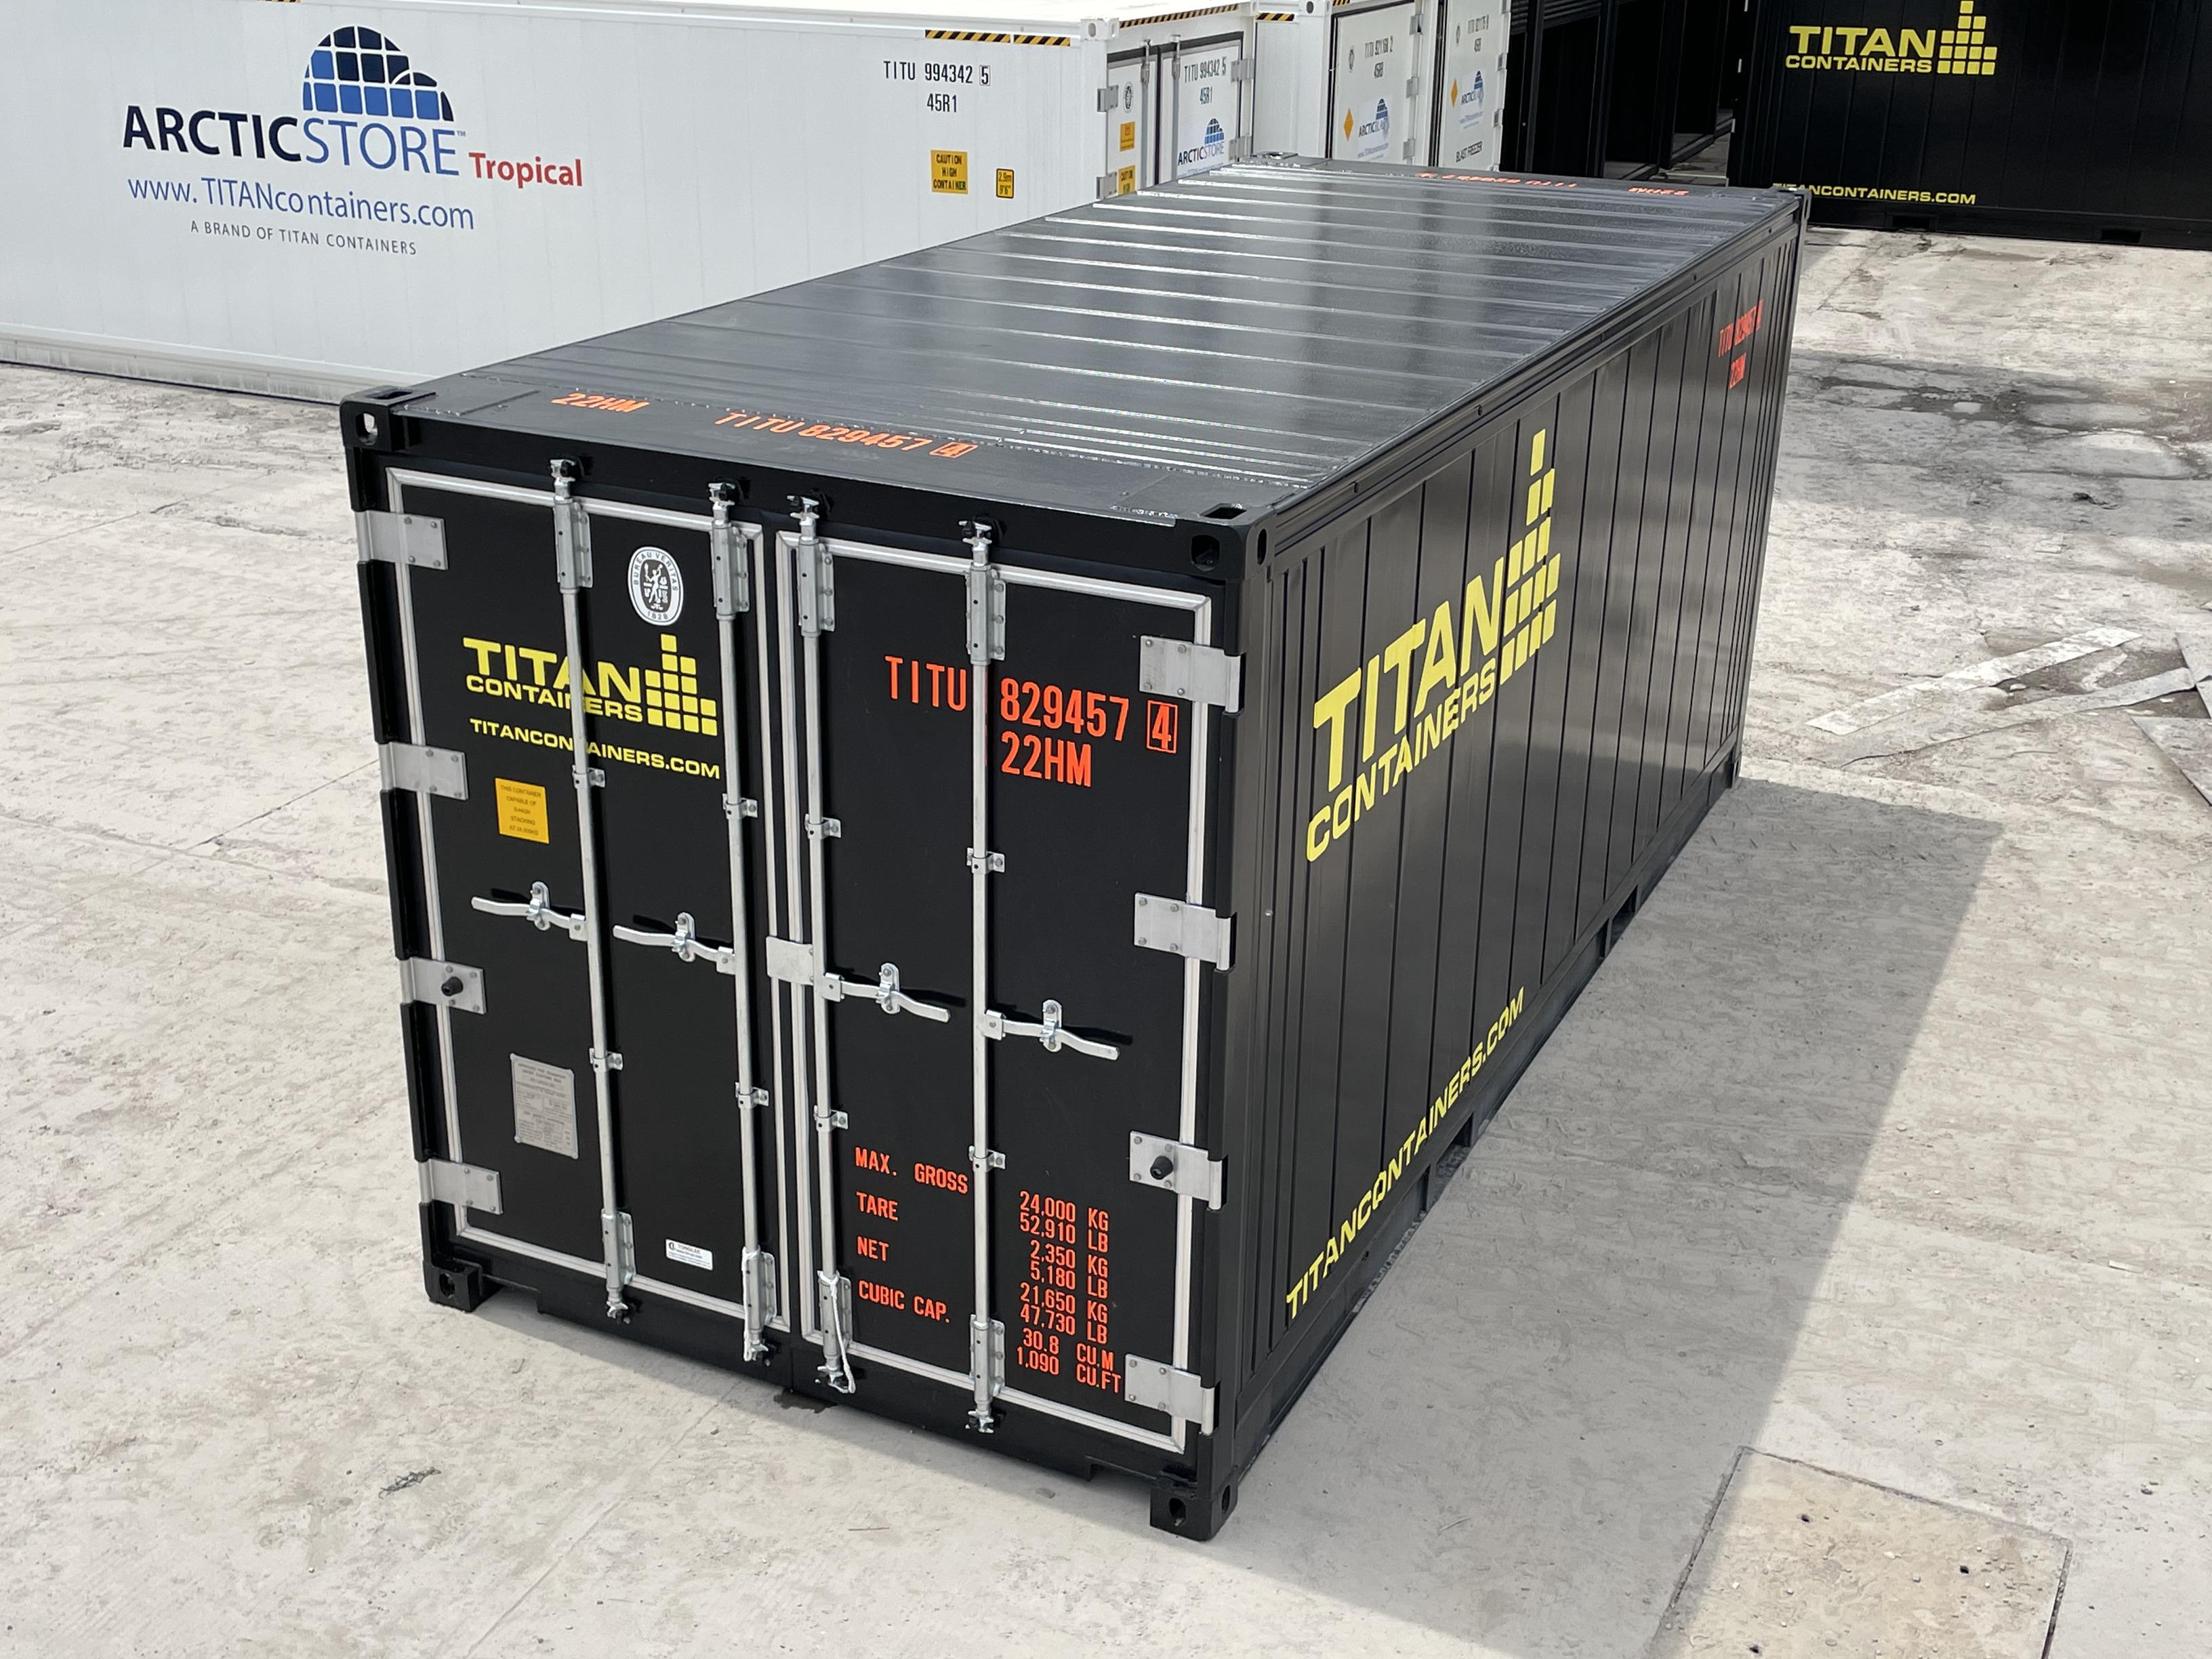 Hotstorage container in black